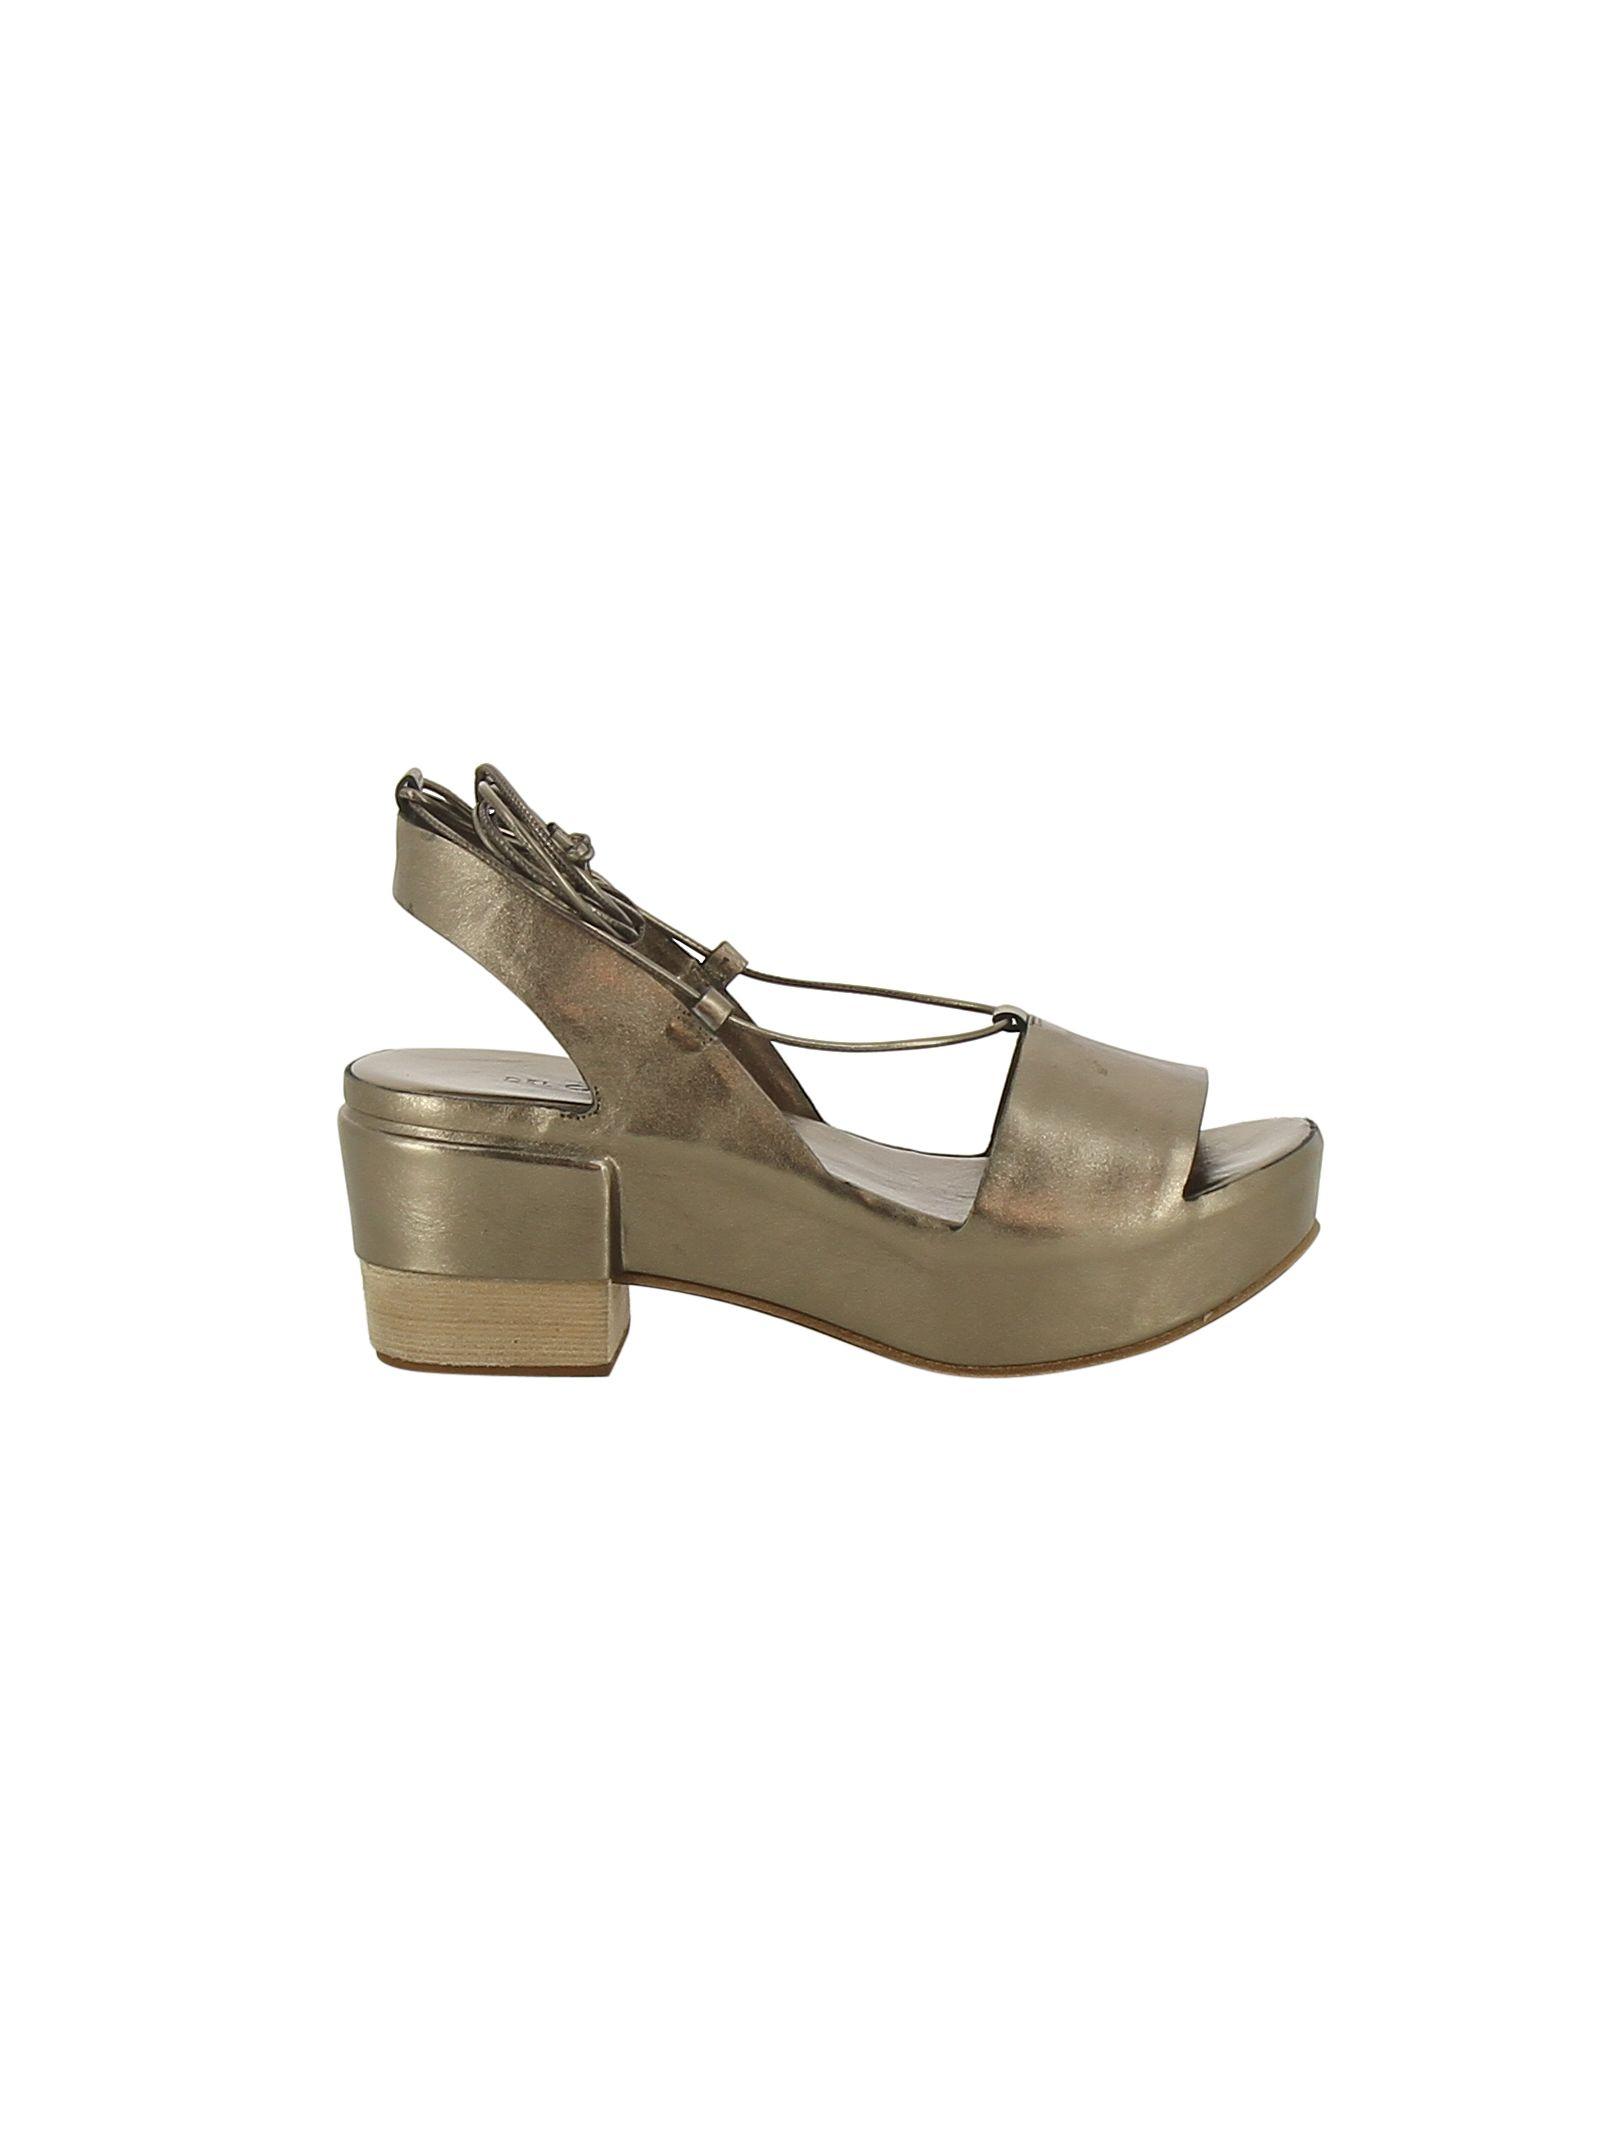 Roberto del Carlo Low Heel Platform Sandals